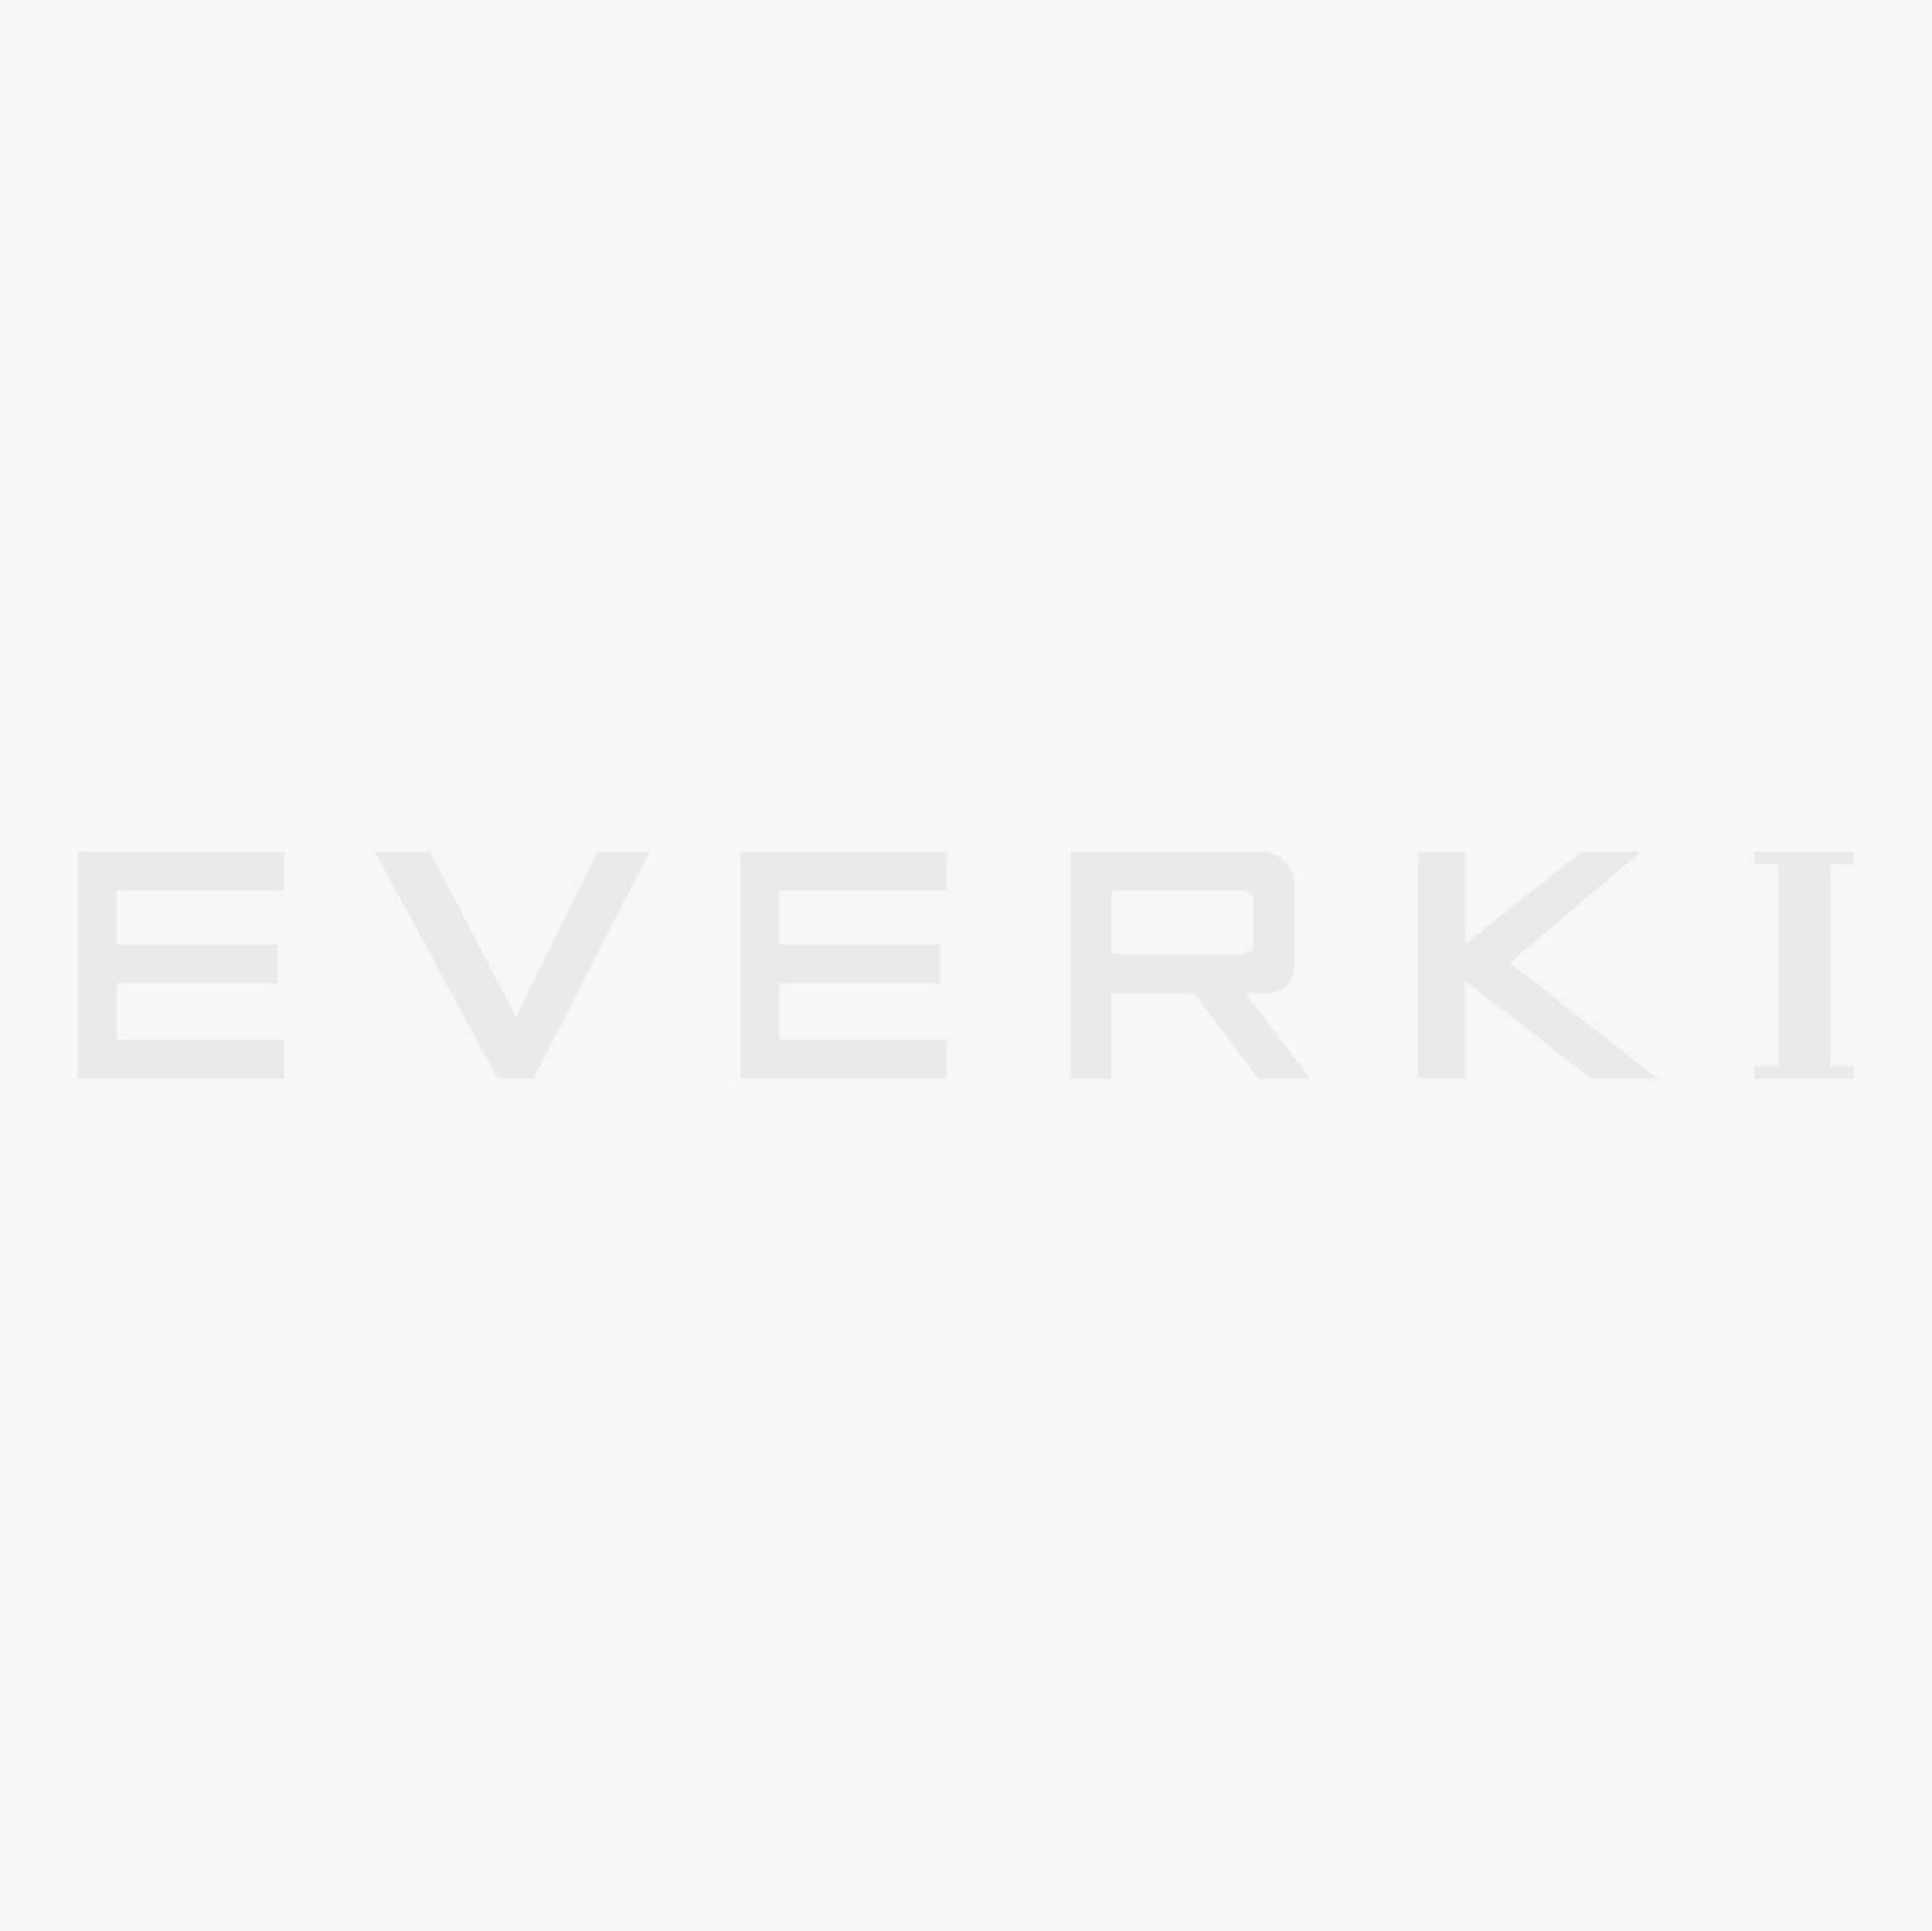 b06ff82223 EVERKI Titan 18 Inch Travel Friendly Laptop Backpack